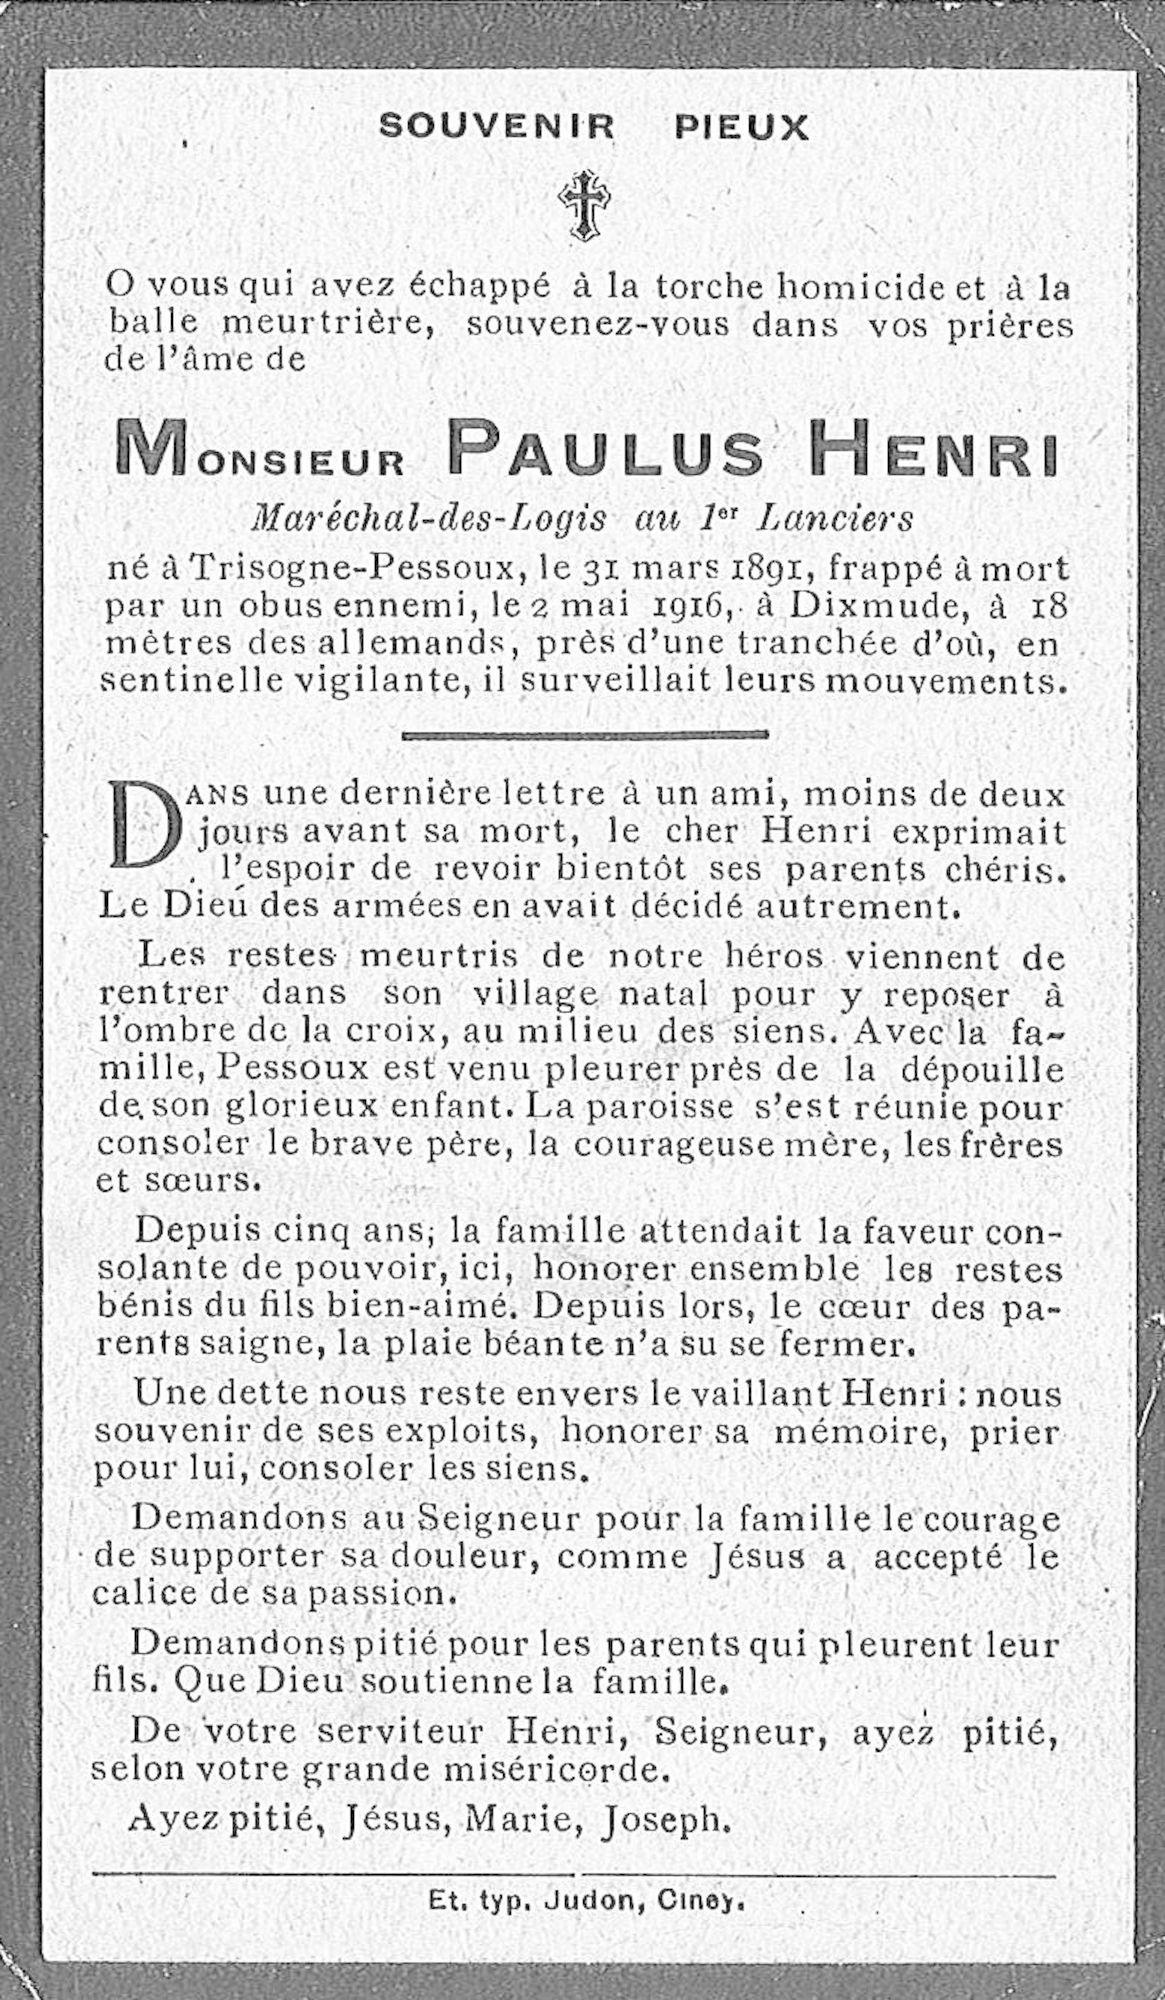 Paulus Henri